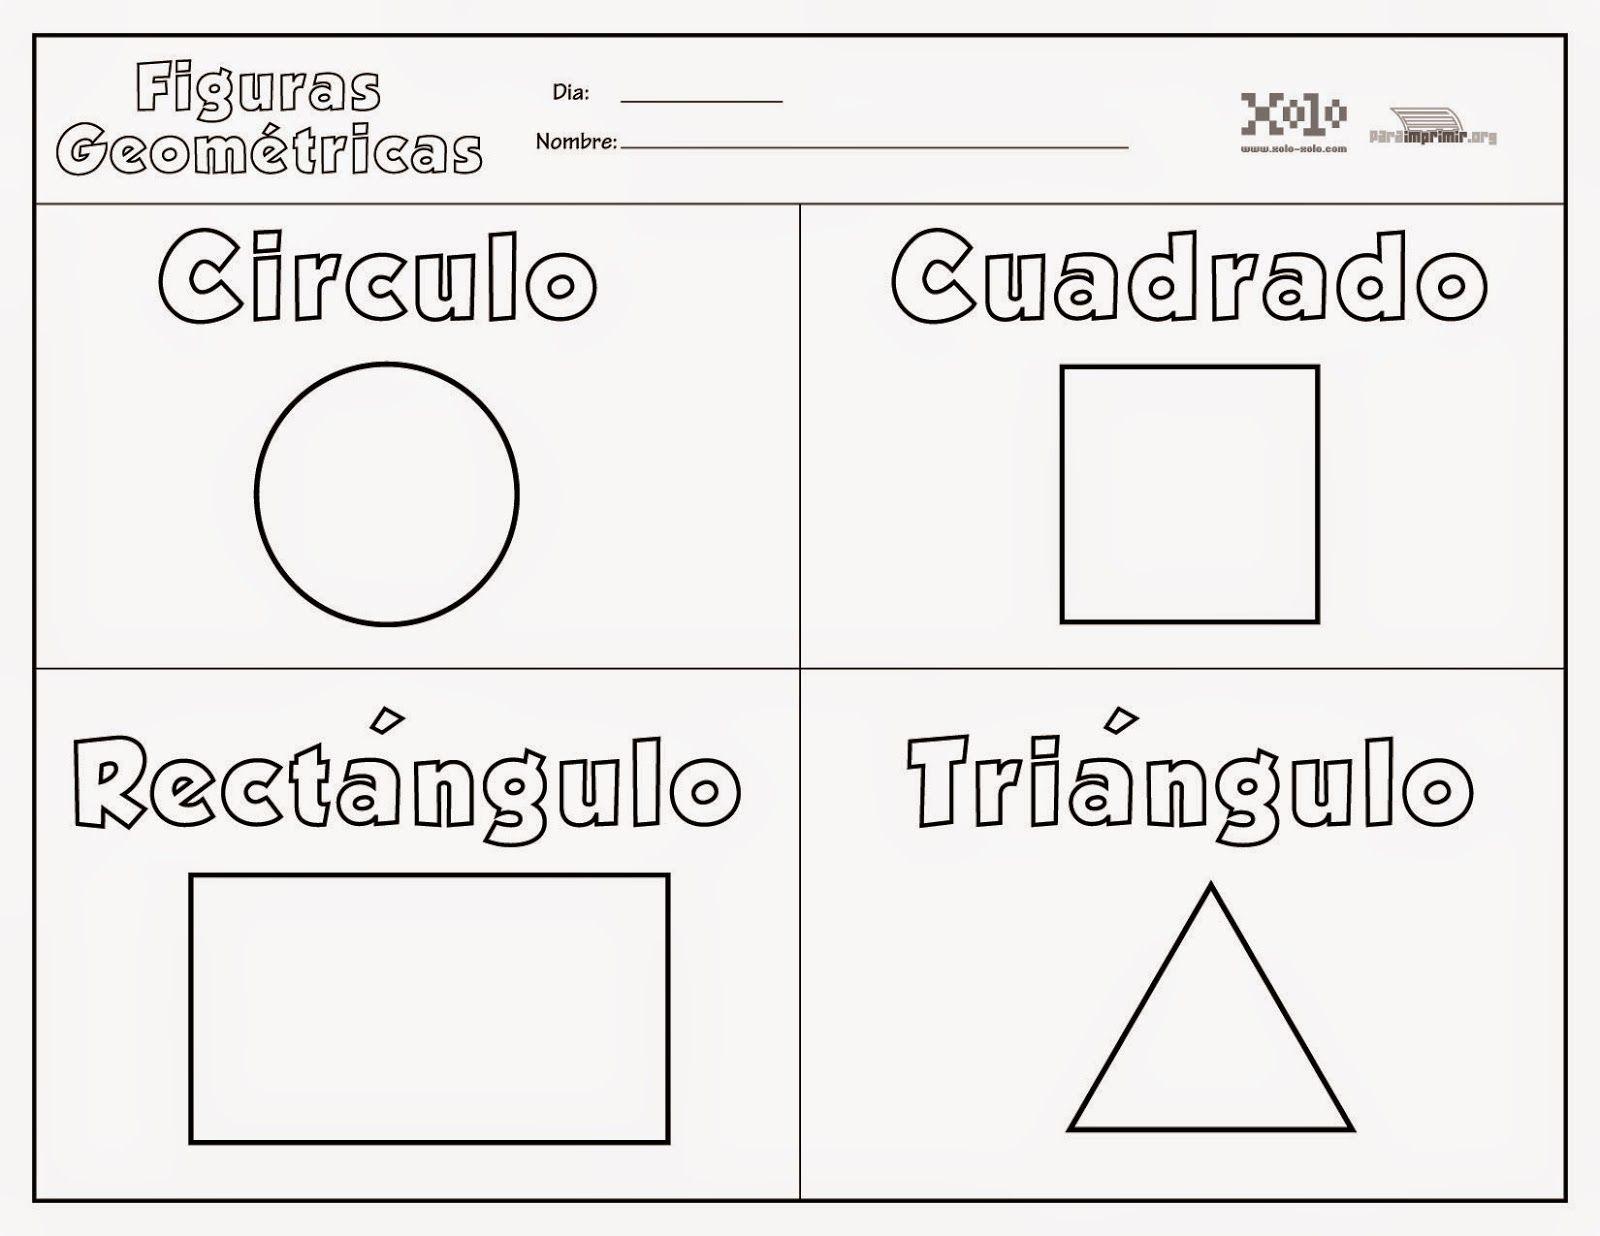 Figuras Geometricas Para Colorear Preescolar 35425